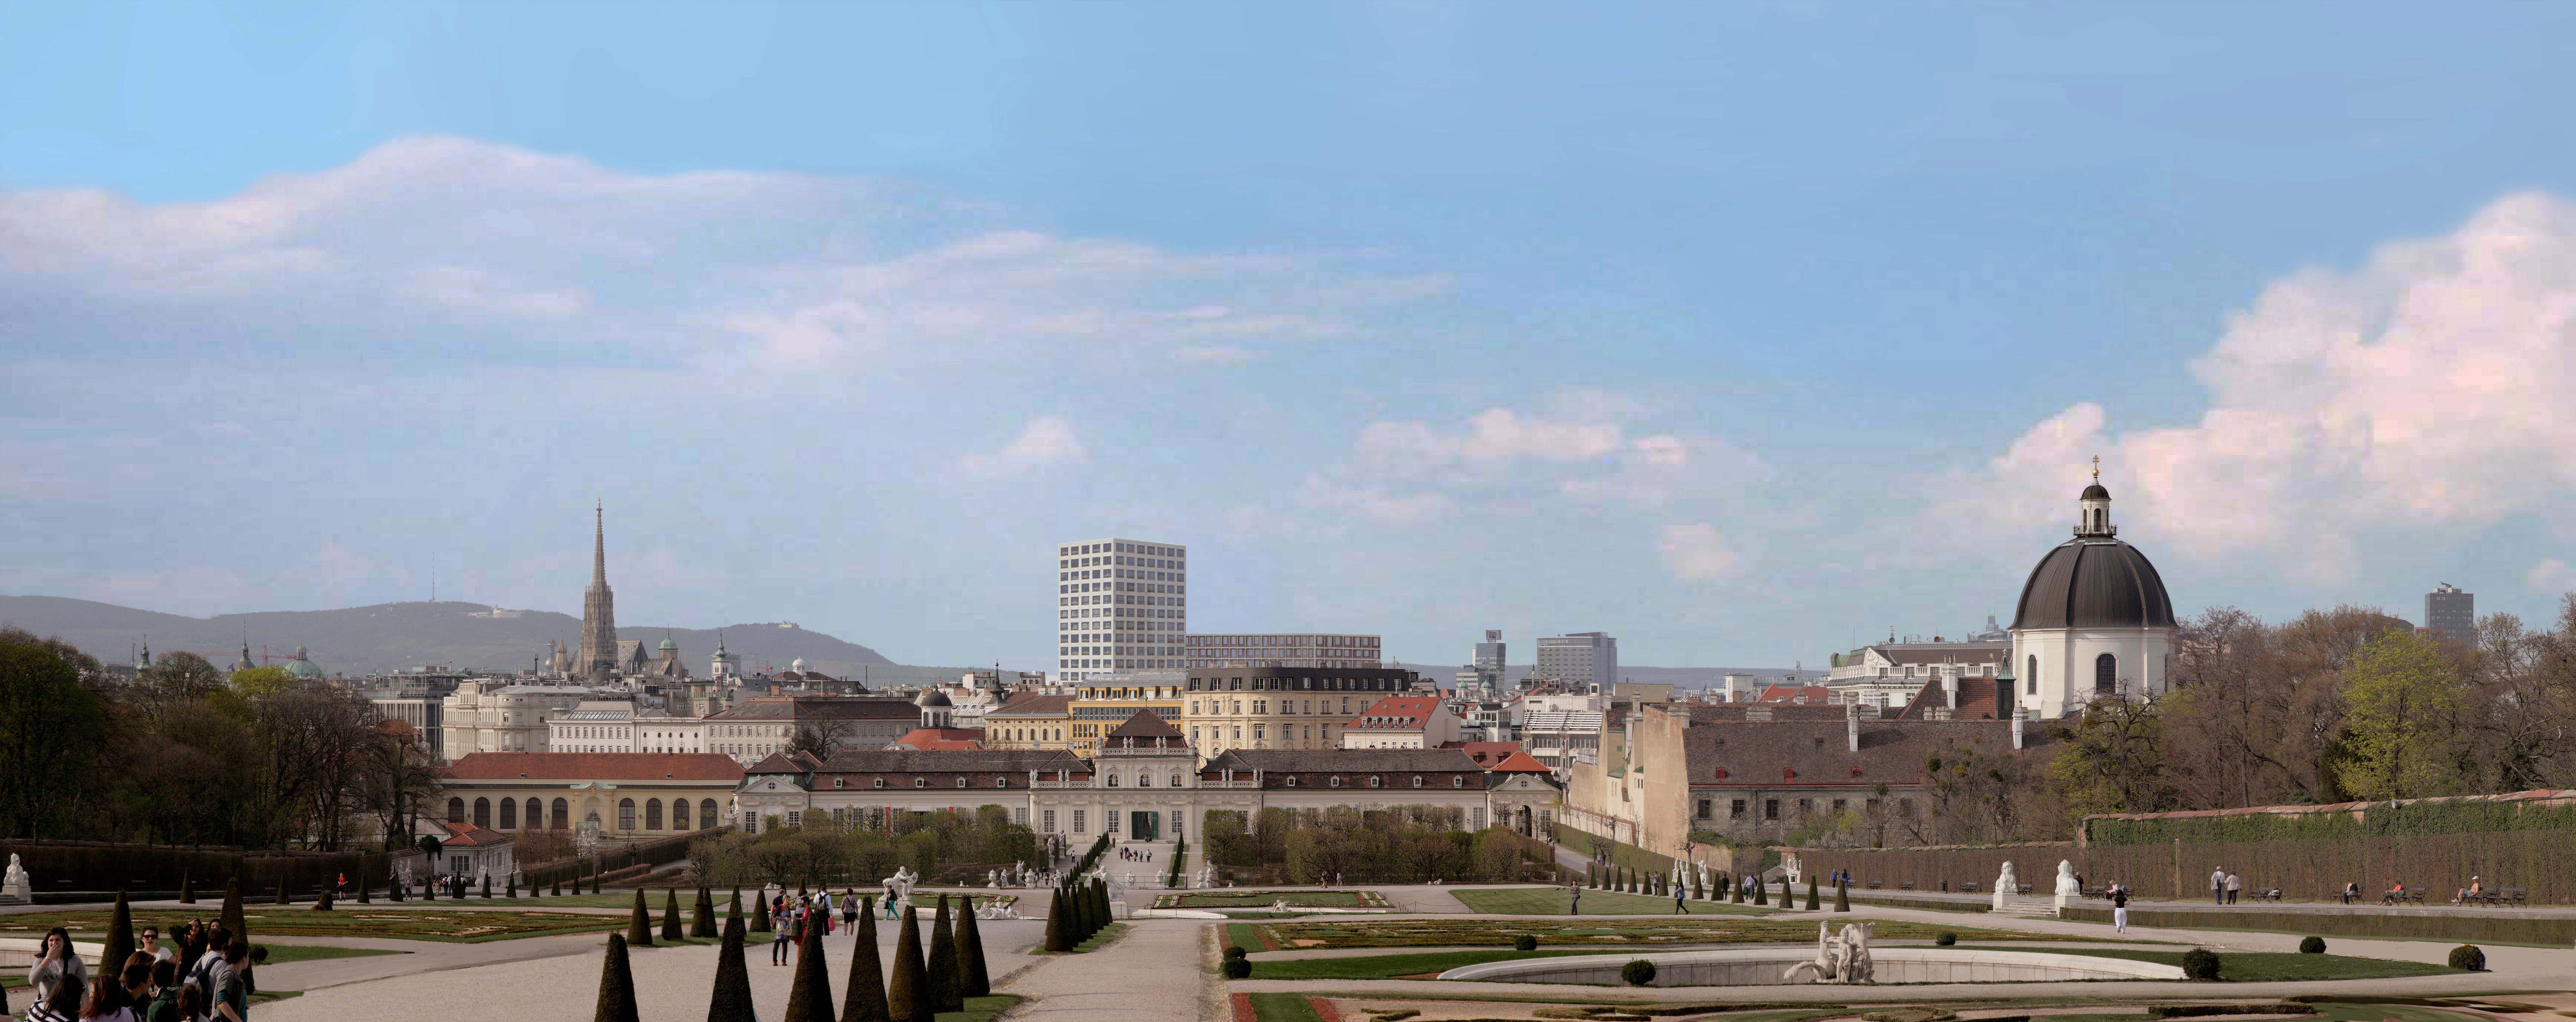 Aktion 21 Pro B Rgerbeteiligung Unesco Erteilt